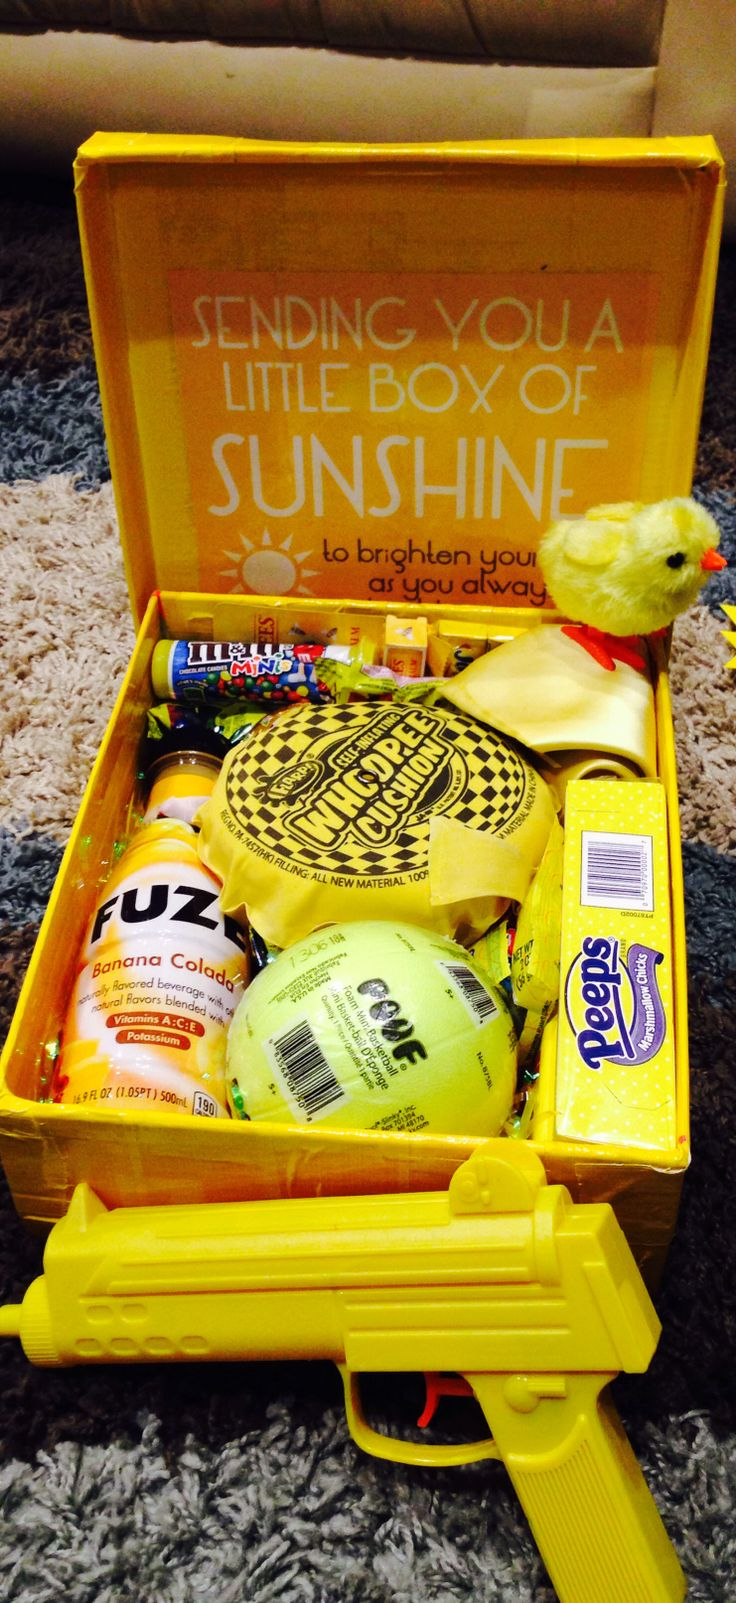 Little box of sunshine to brighten up their day!